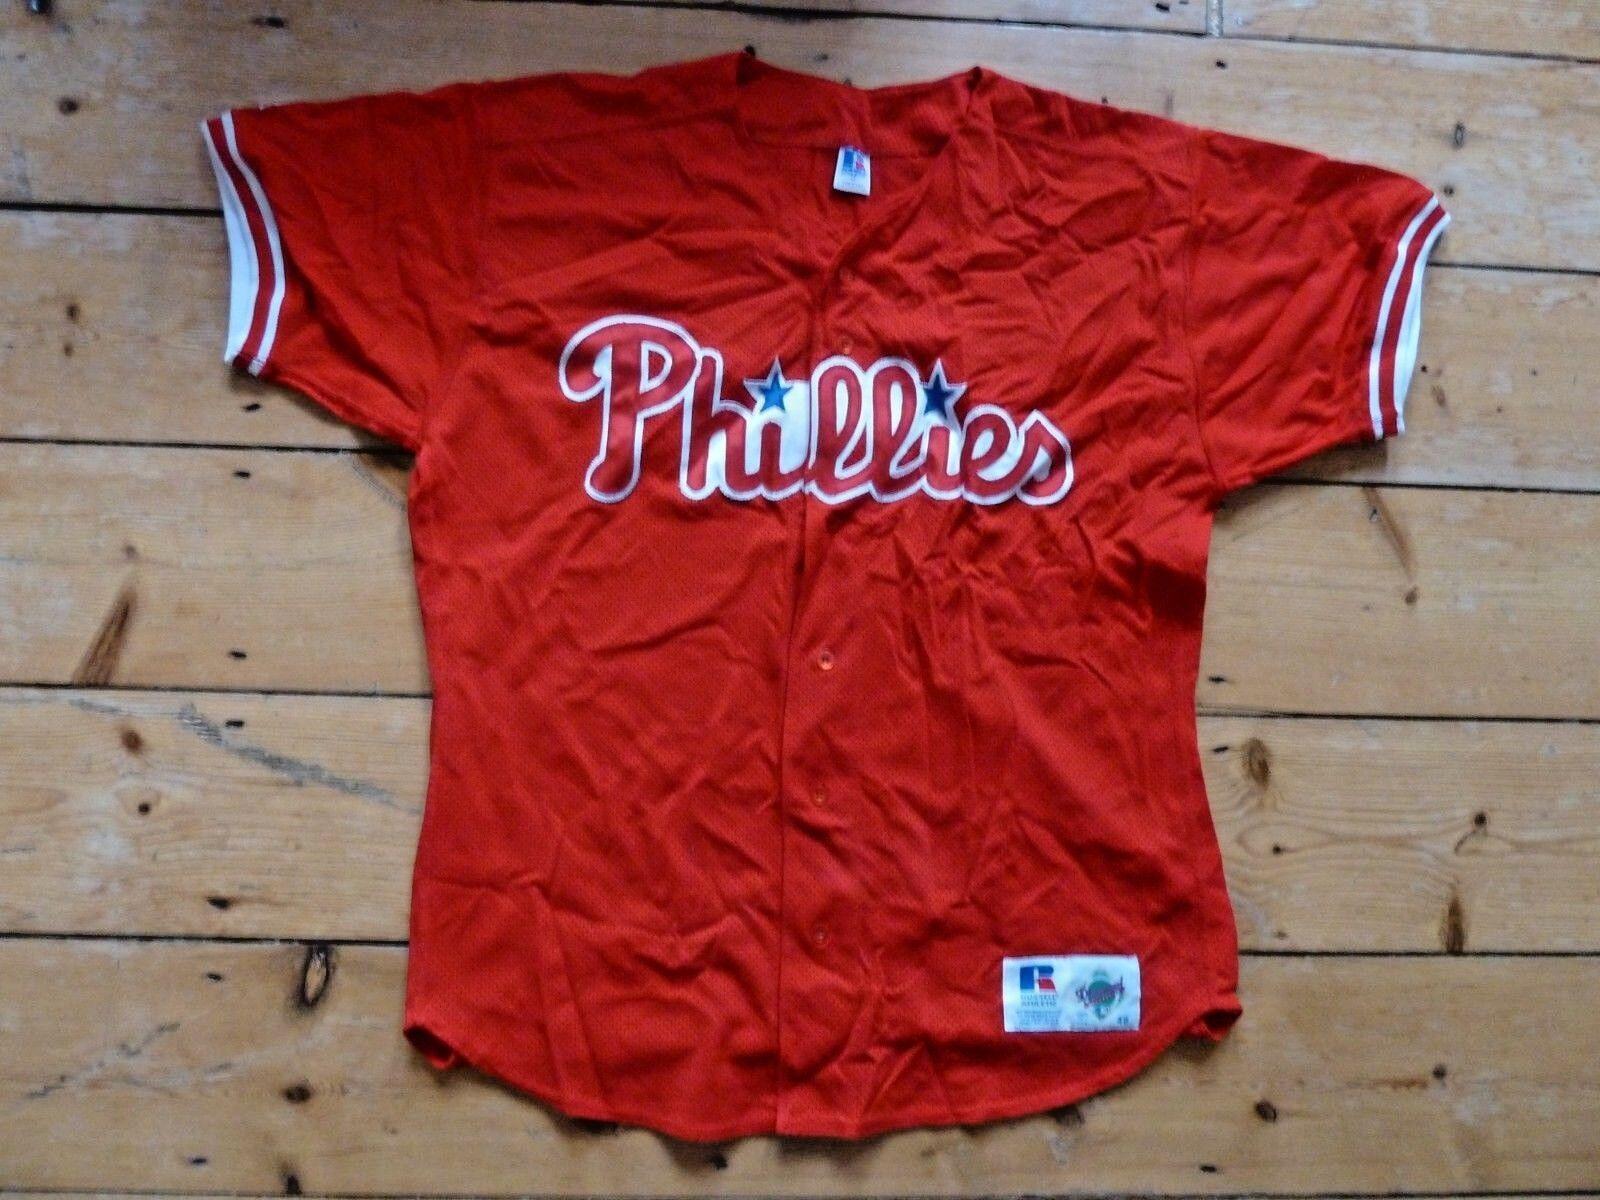 85c42a35b8e Philadelphia Phillies MLB Official Baseball Jersey Shirt size 48 (size large )